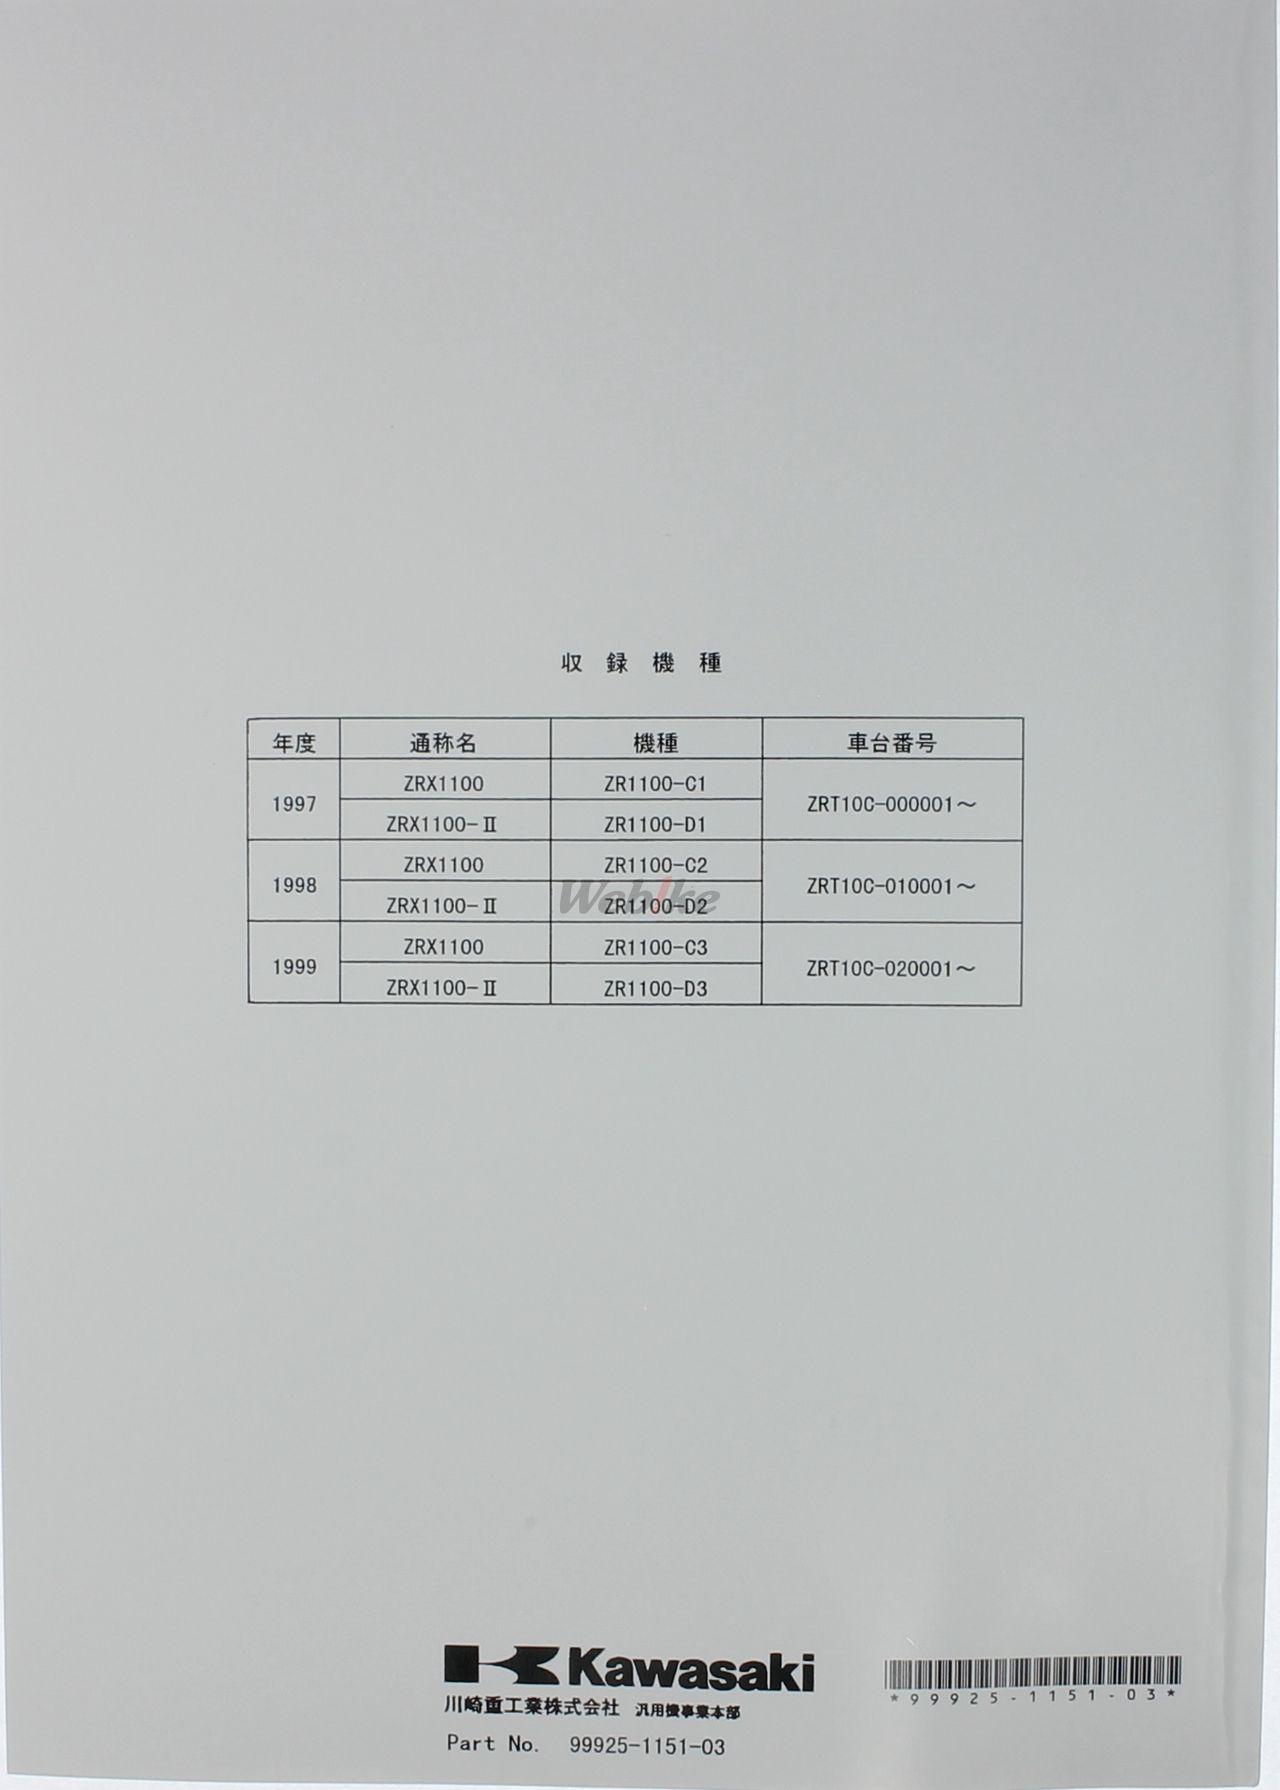 【KAWASAKI】ZRX1100 維修手冊(基本版) - 「Webike-摩托百貨」